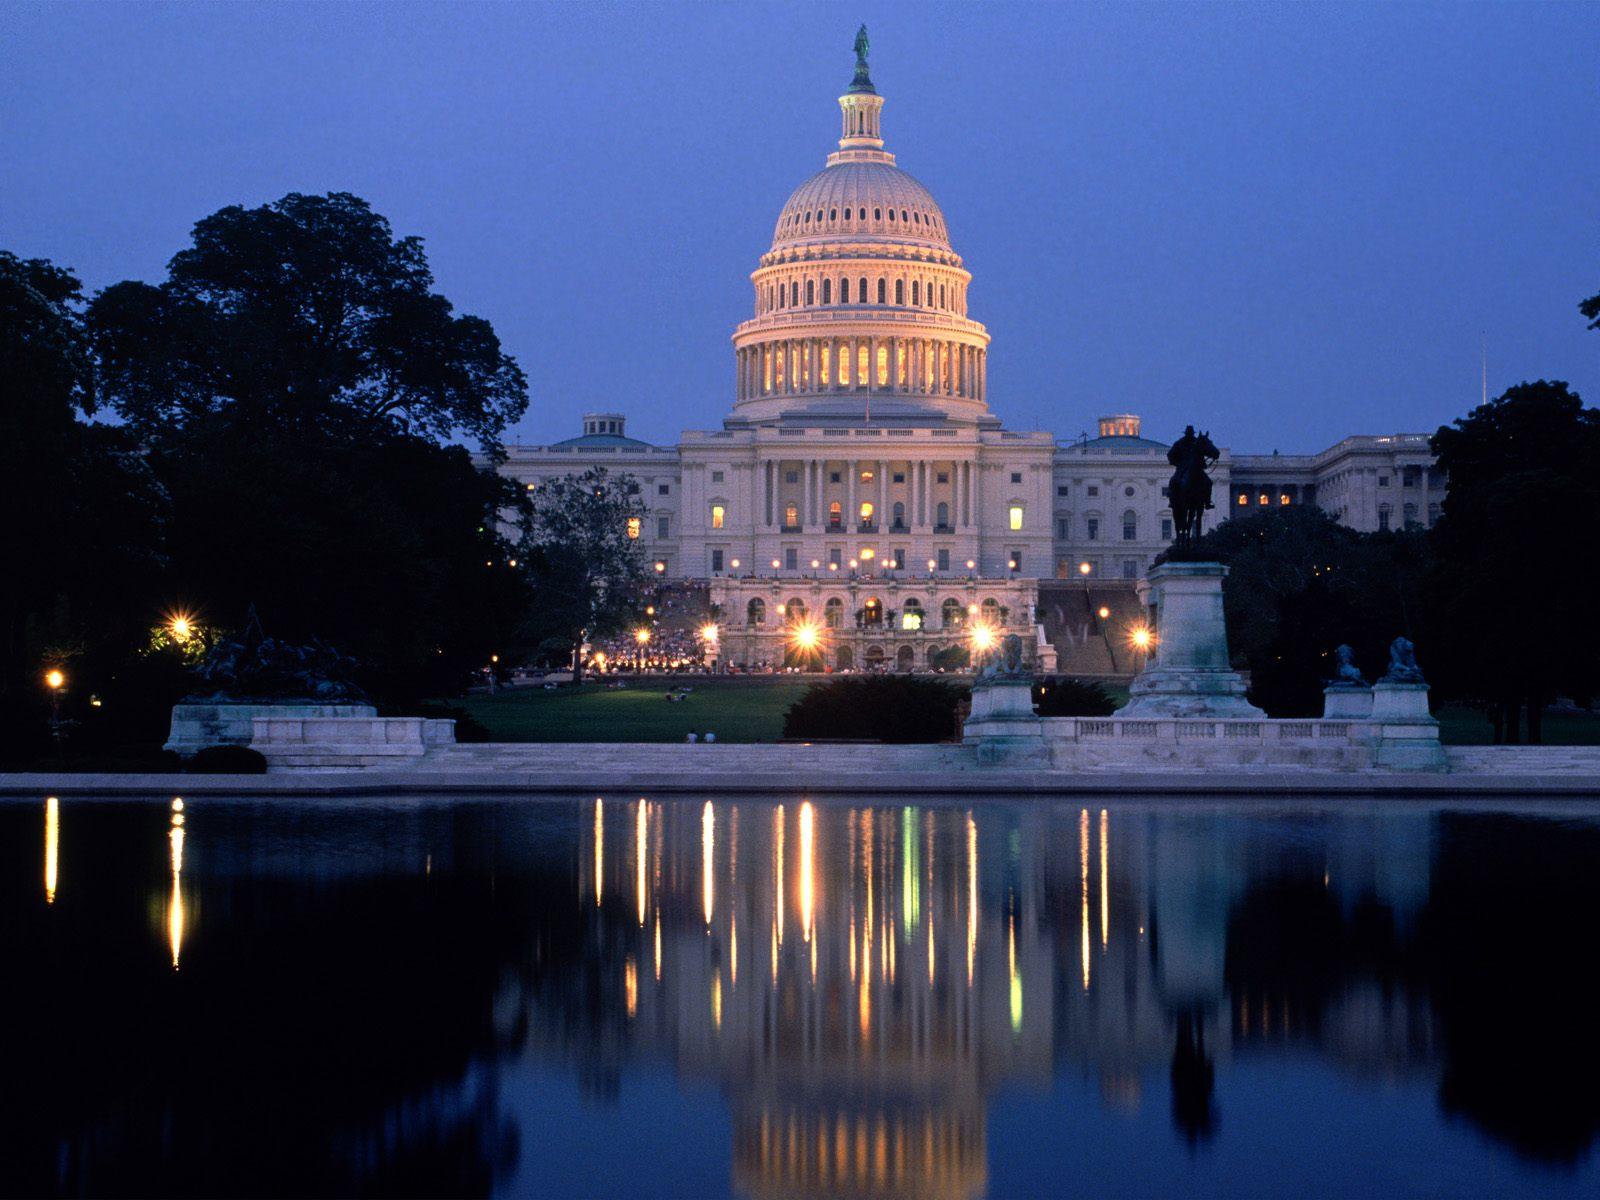 Washington DC desktop wallpaper United States of America wallpapers 1600x1200